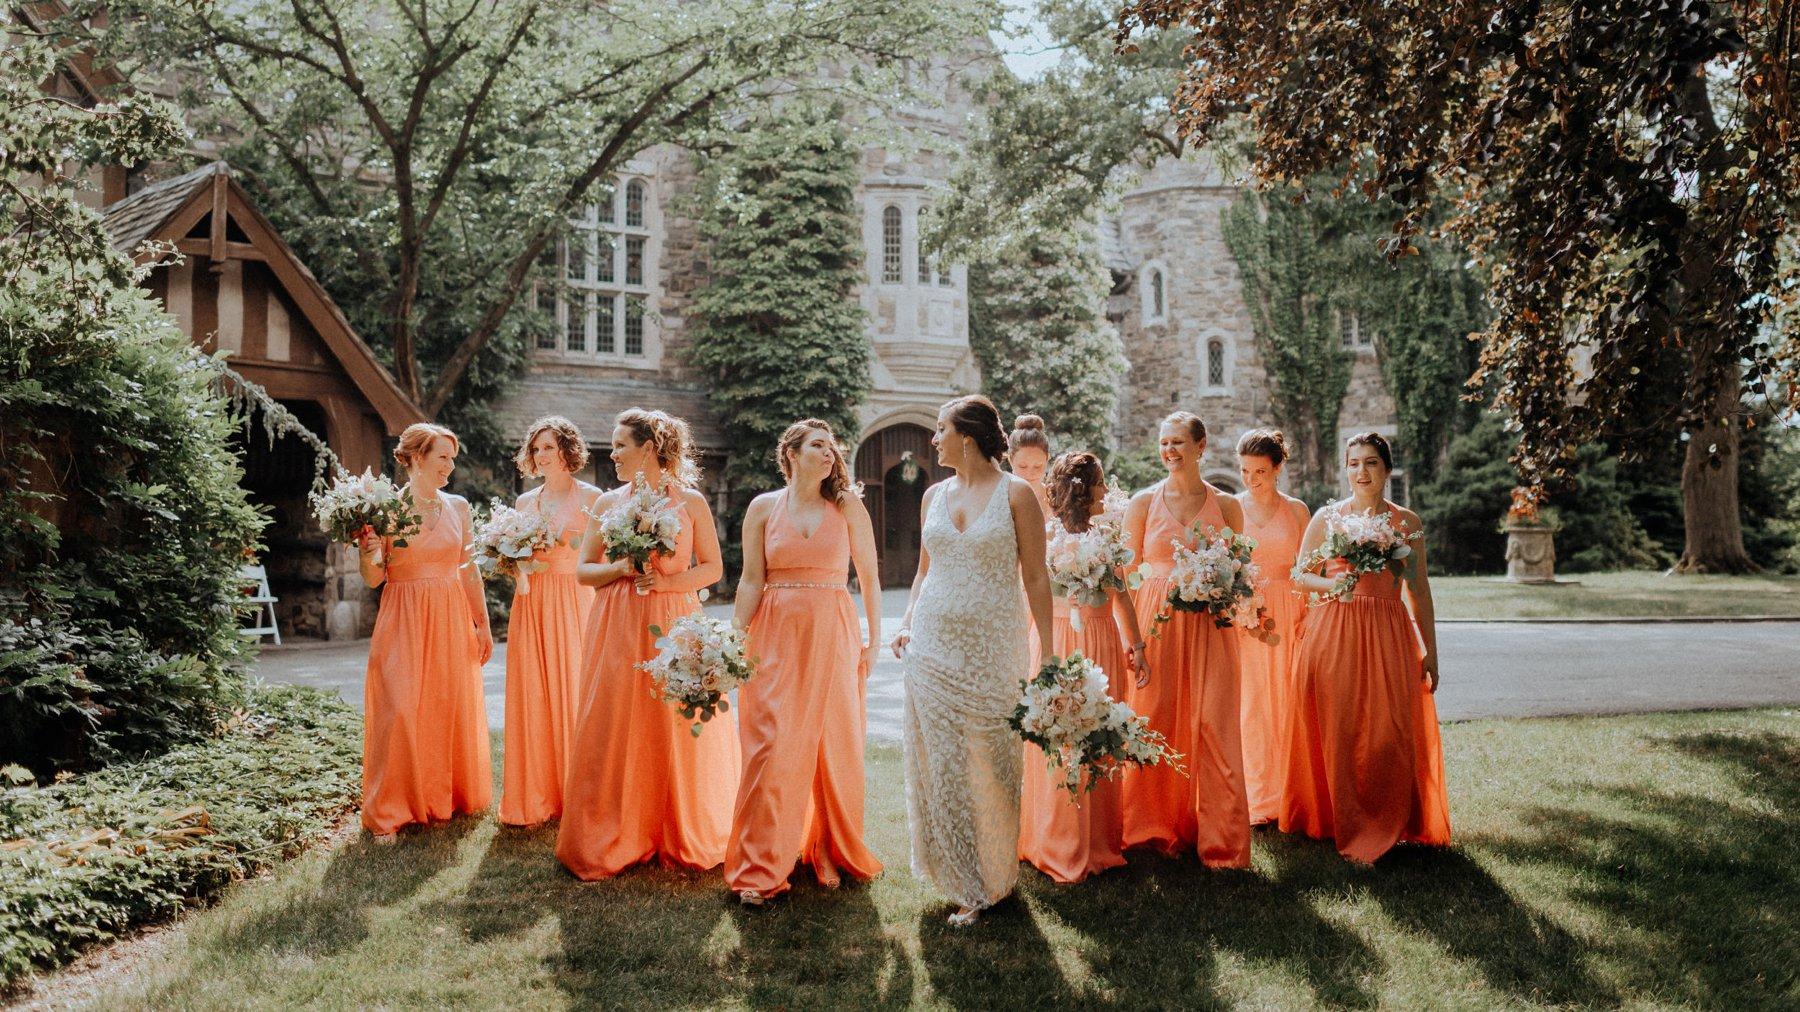 066-042-new-jersey-wedding-photographer-8.jpg